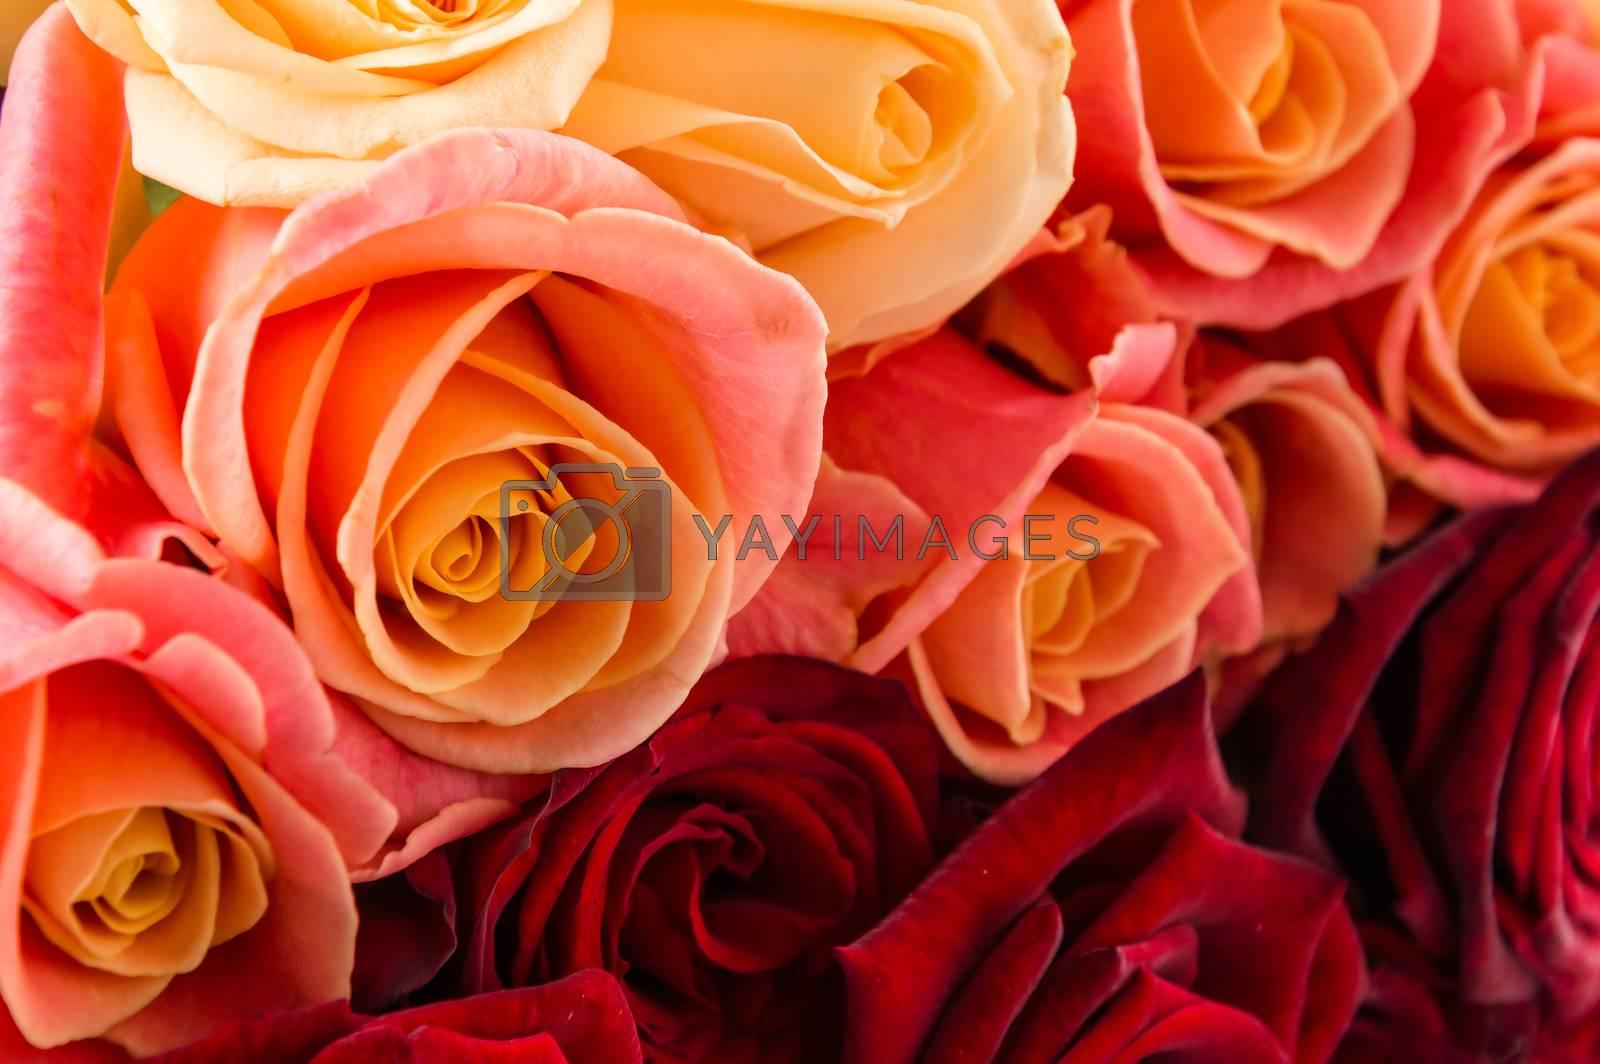 Many rose flowers